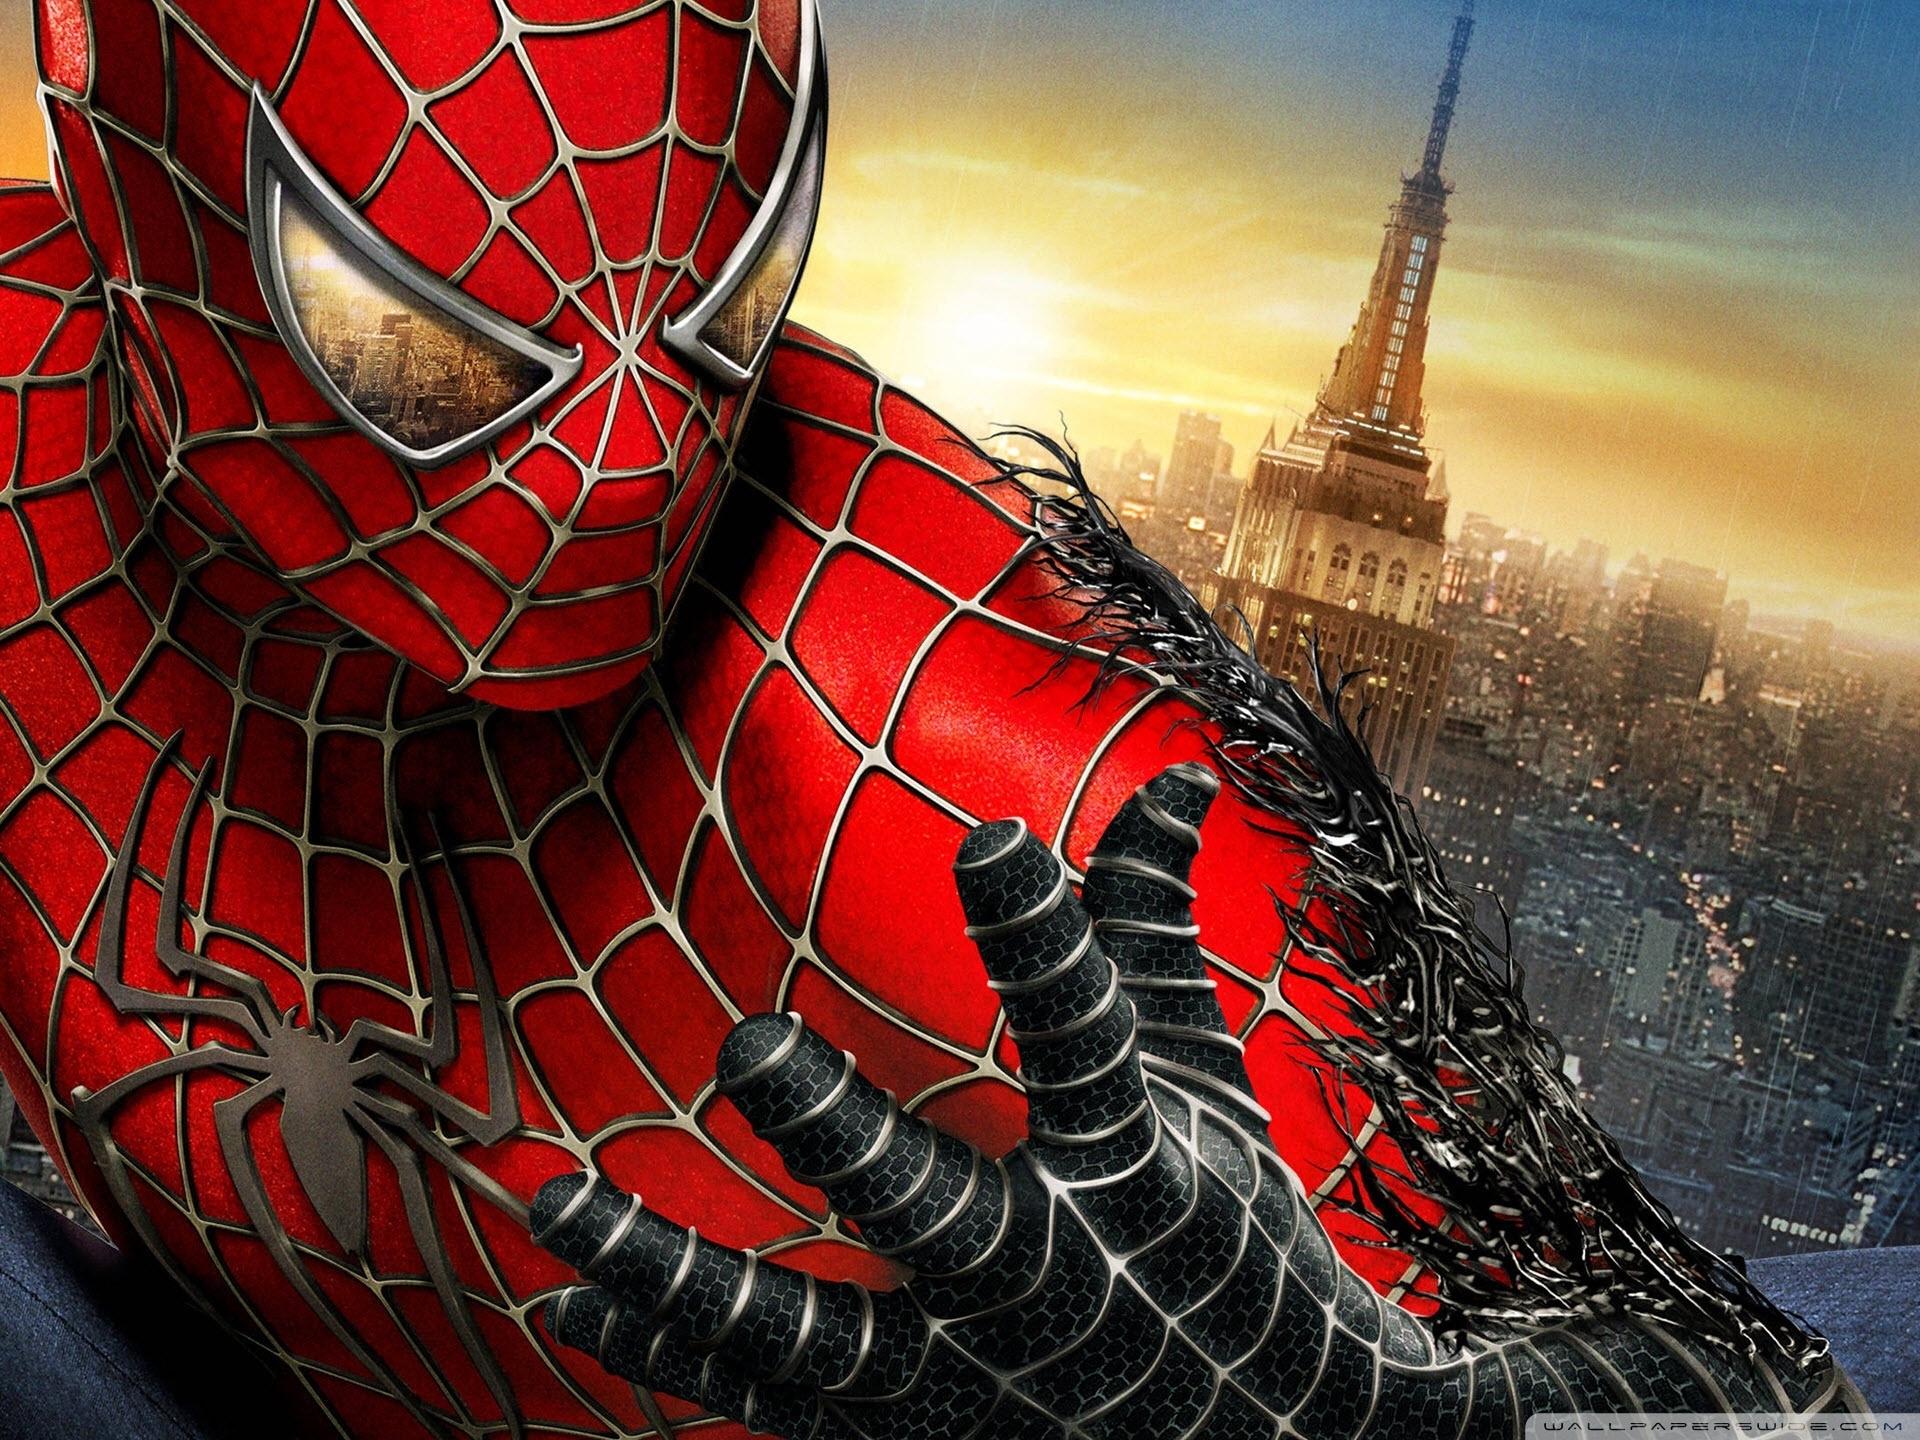 10 Best Spider Man 2099 Wallpaper Hd Full Hd 1920 1080 For: 10 Top Spiderman Wallpaper Hd 1080P FULL HD 1920×1080 For